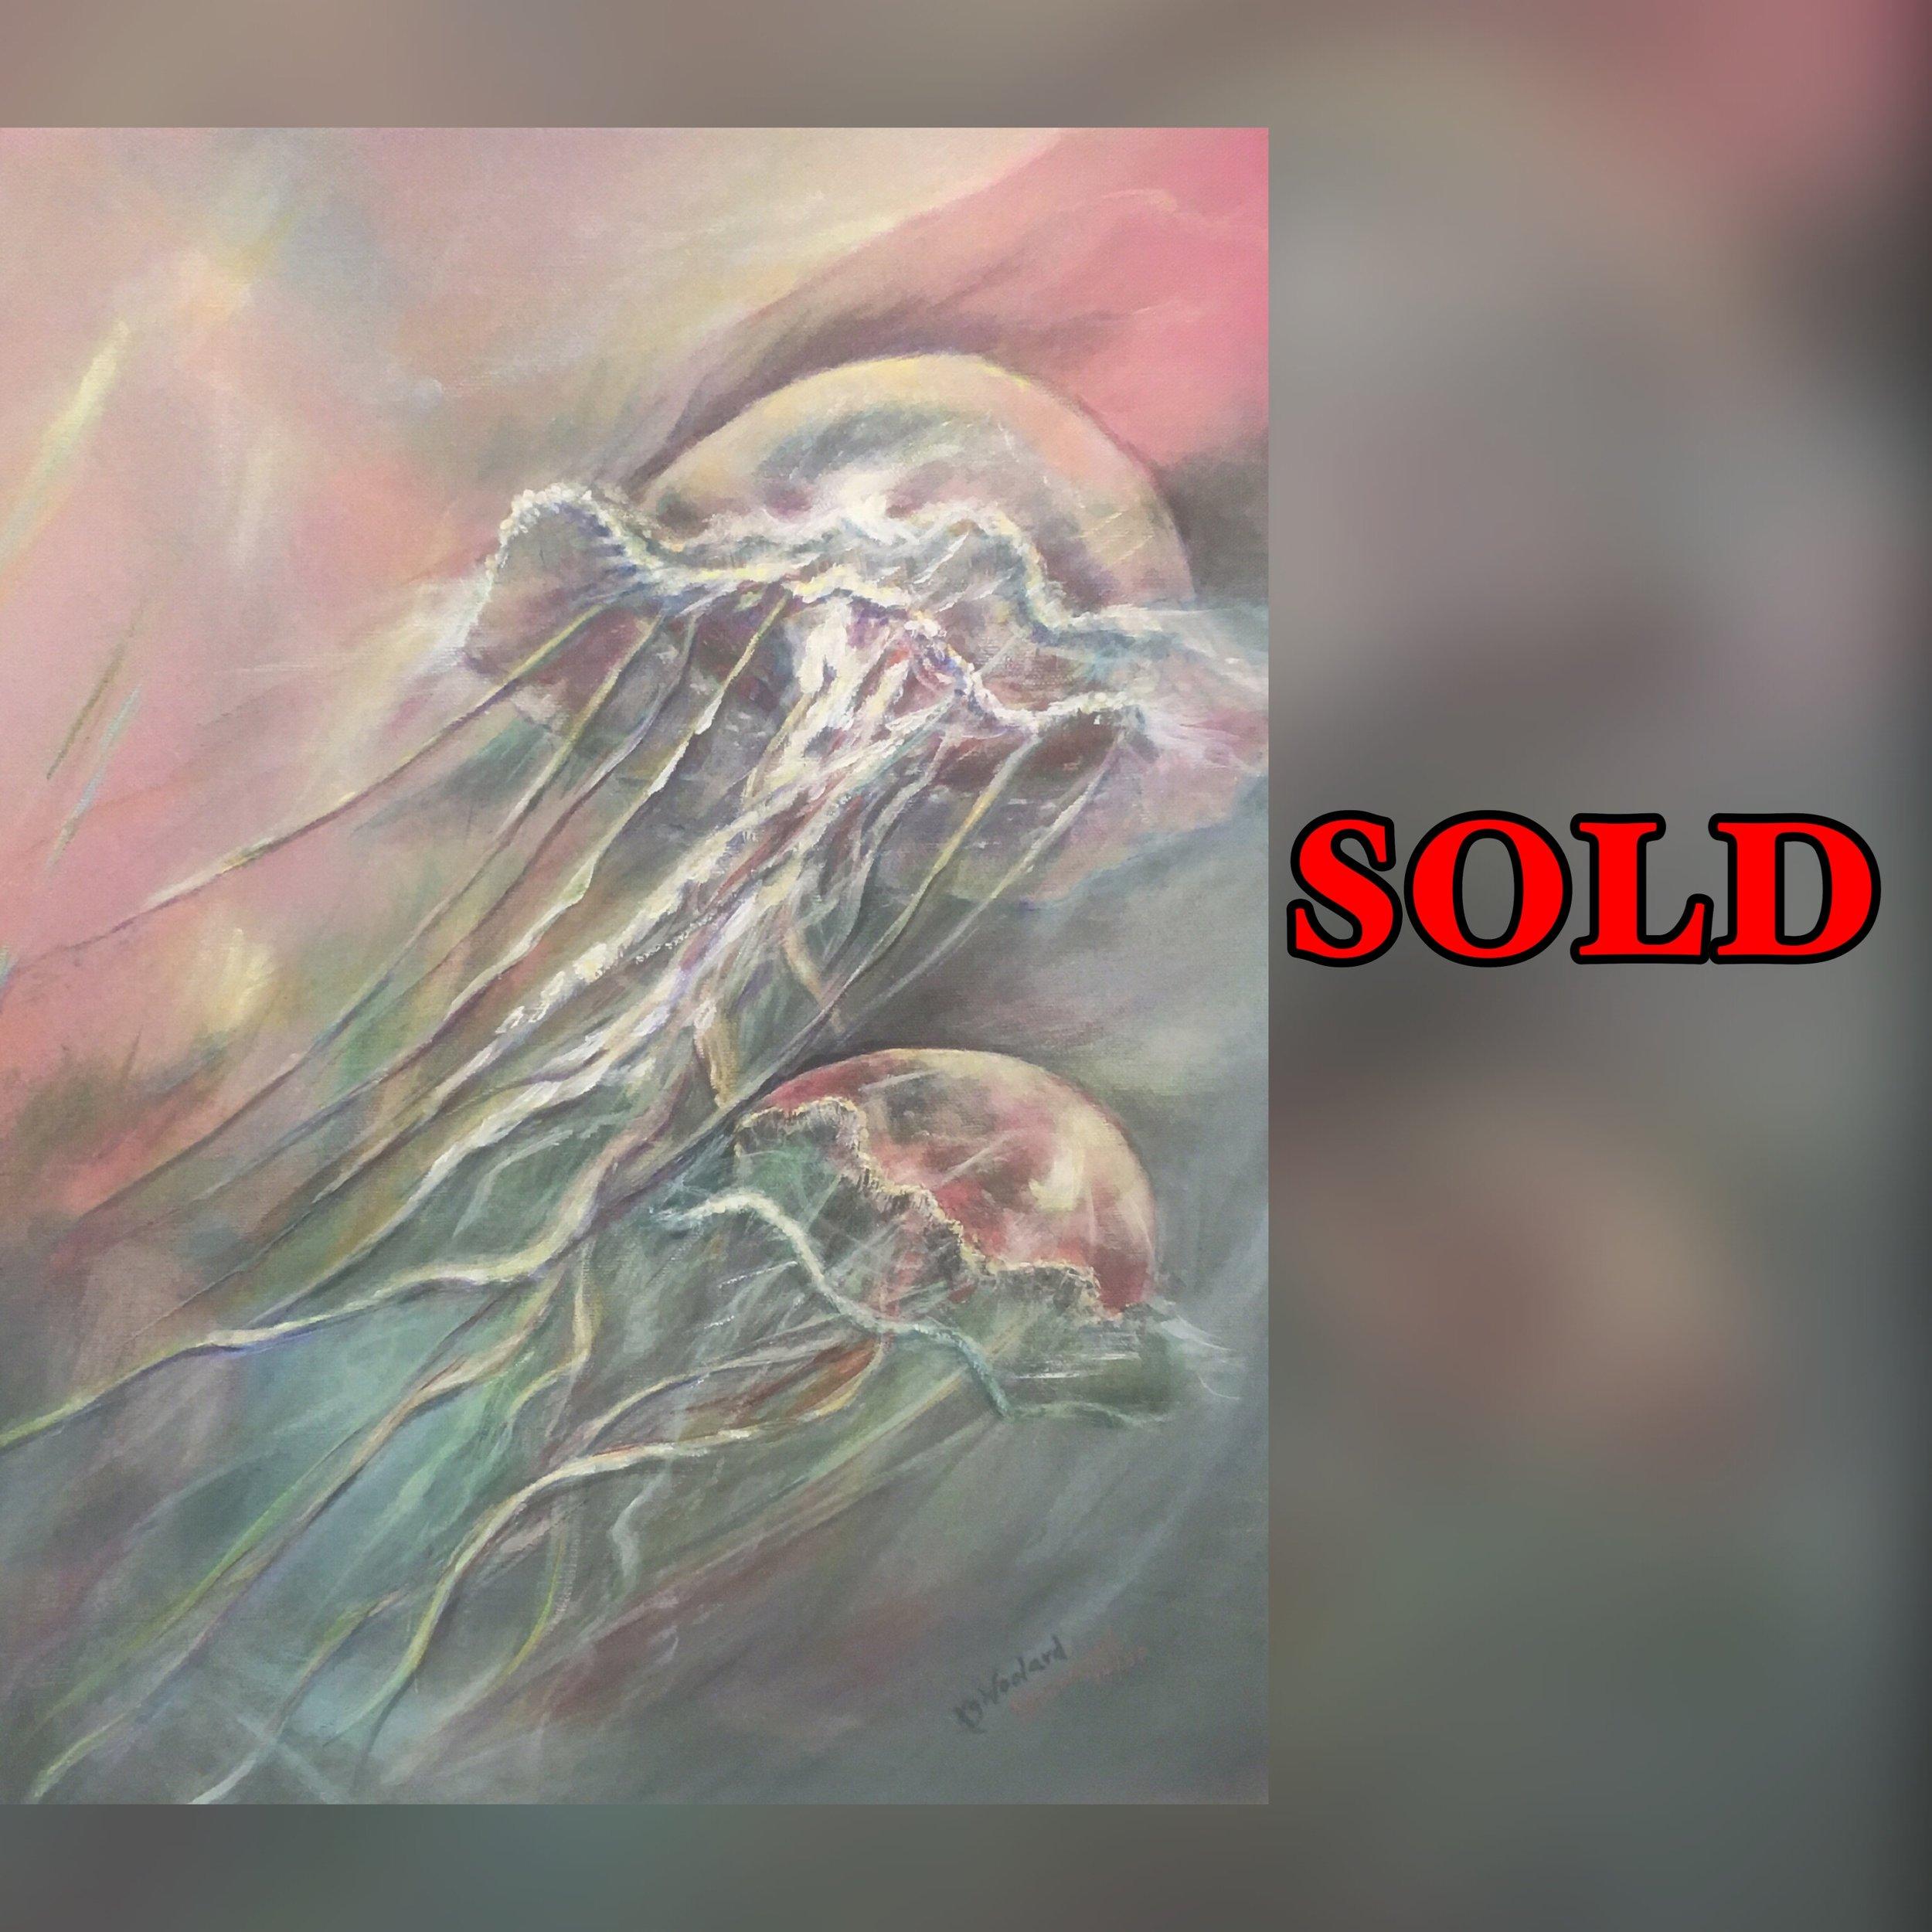 Kay Jellyfish Dance Sold.JPG